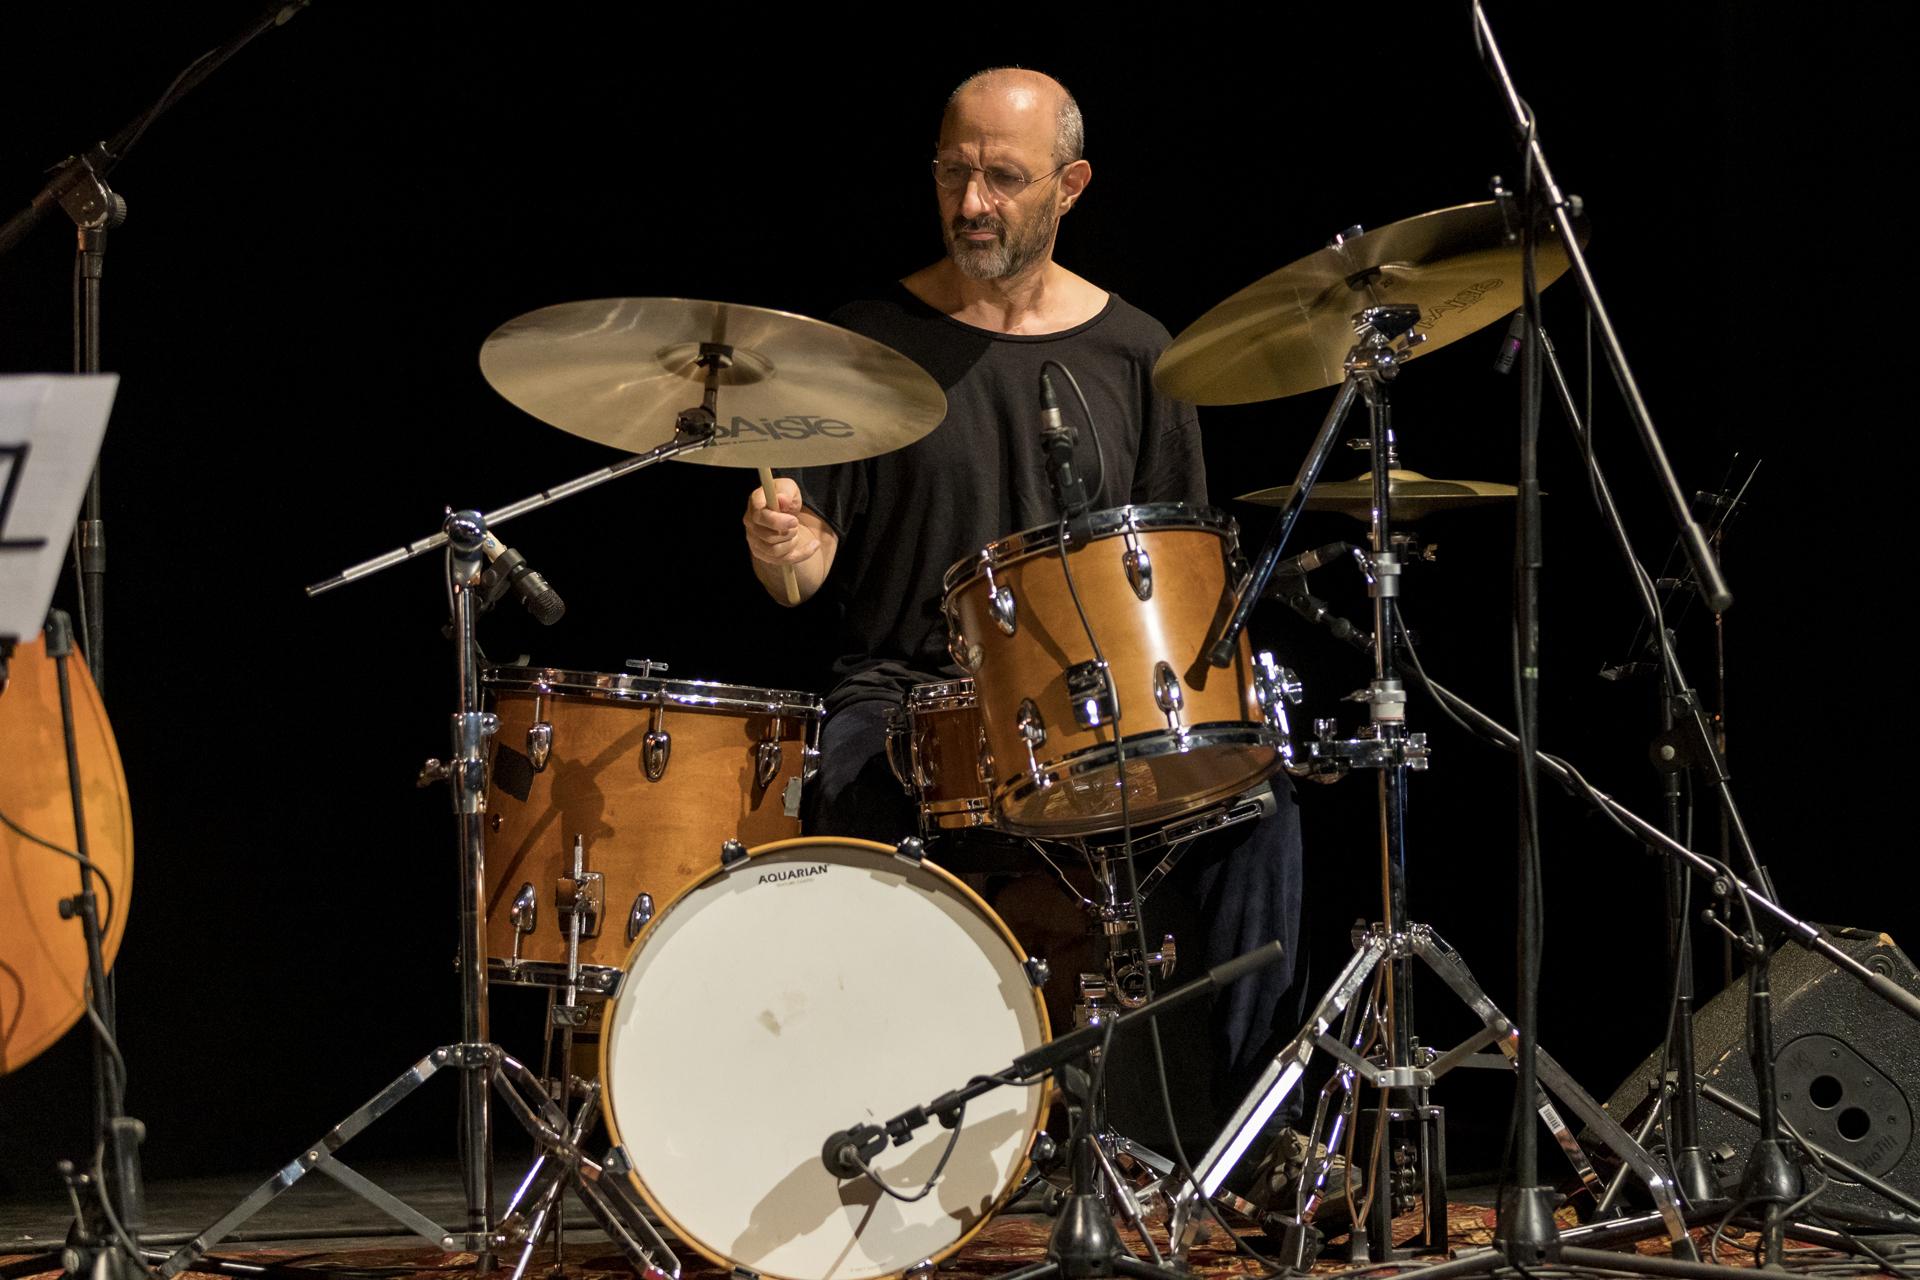 2019_09_13-Iverson-Sanders-Rossy-Trio-©-Luca-Vantusso-225647-EOSR6800